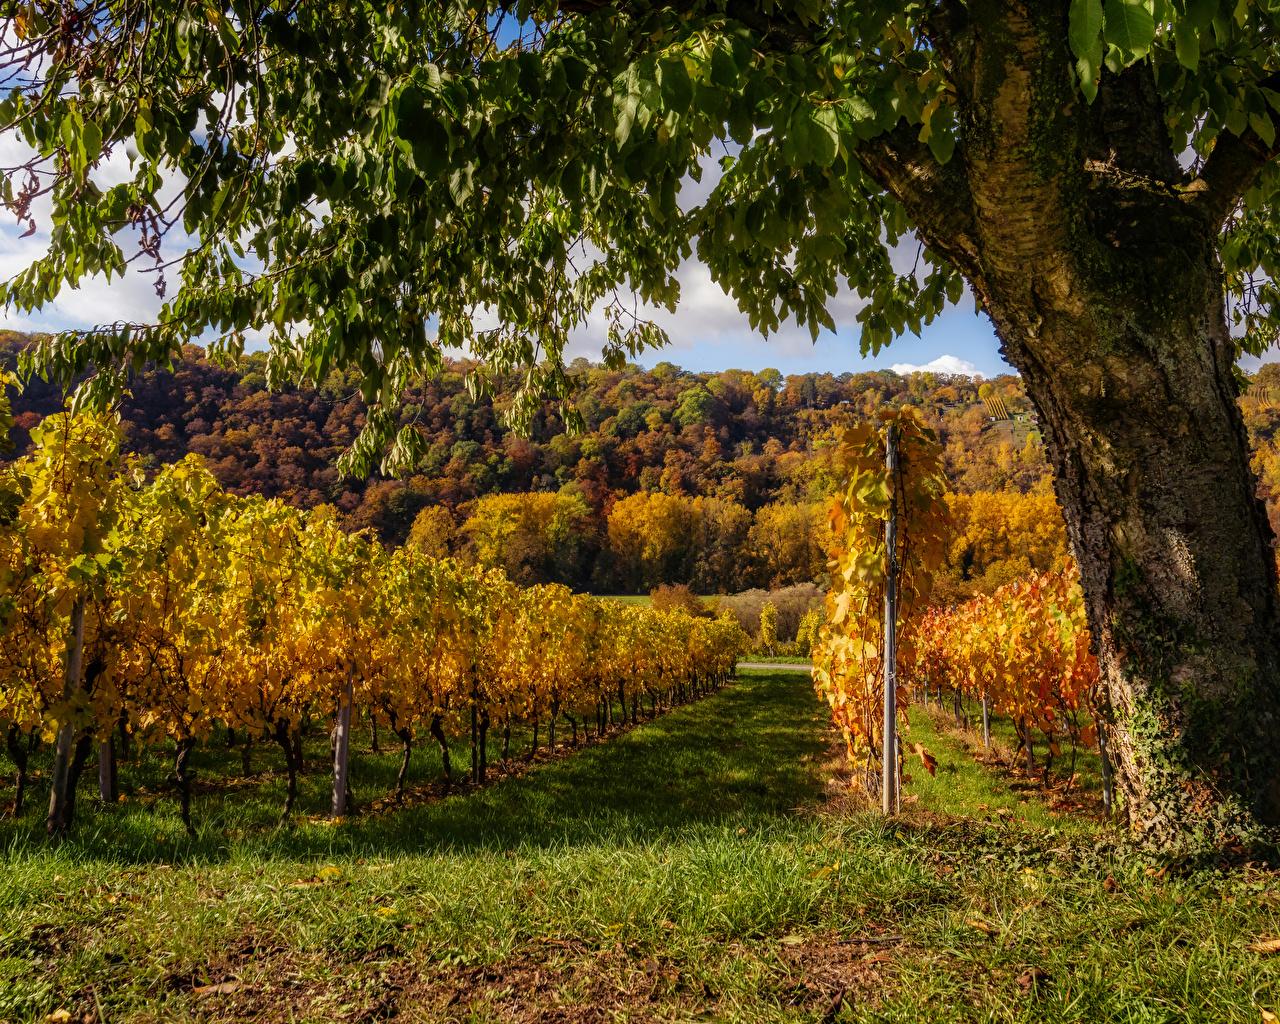 Desktop Wallpapers Germany Baden-Wuerttemberg Vineyard Autumn Nature Grass Bush Trees Shrubs